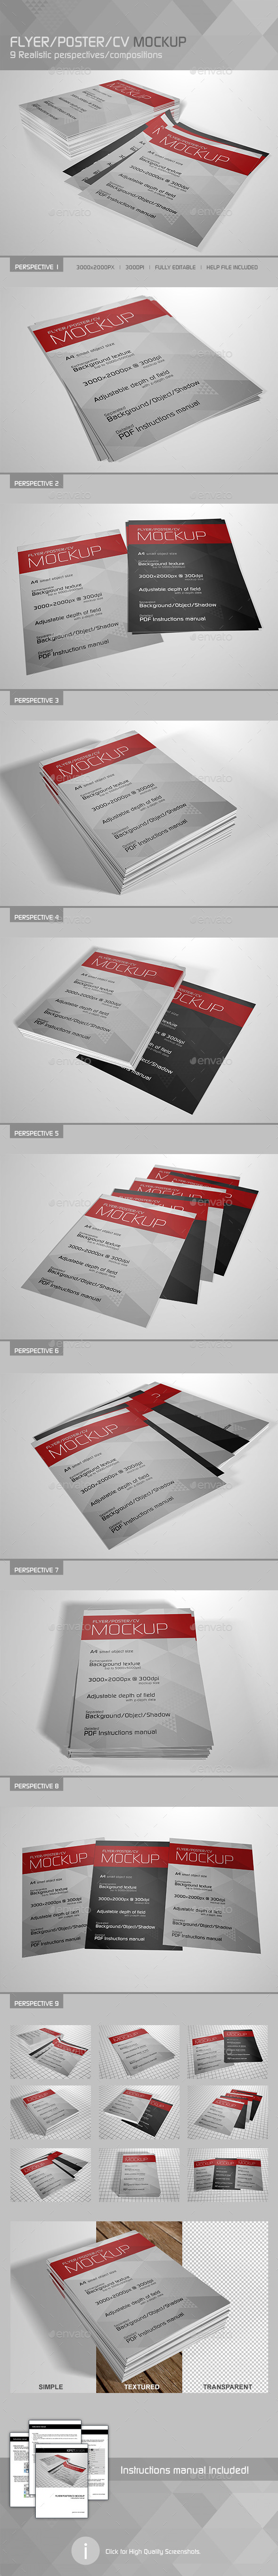 Realistic Flyer/Poster/CV Mockup 3 - Flyers Print